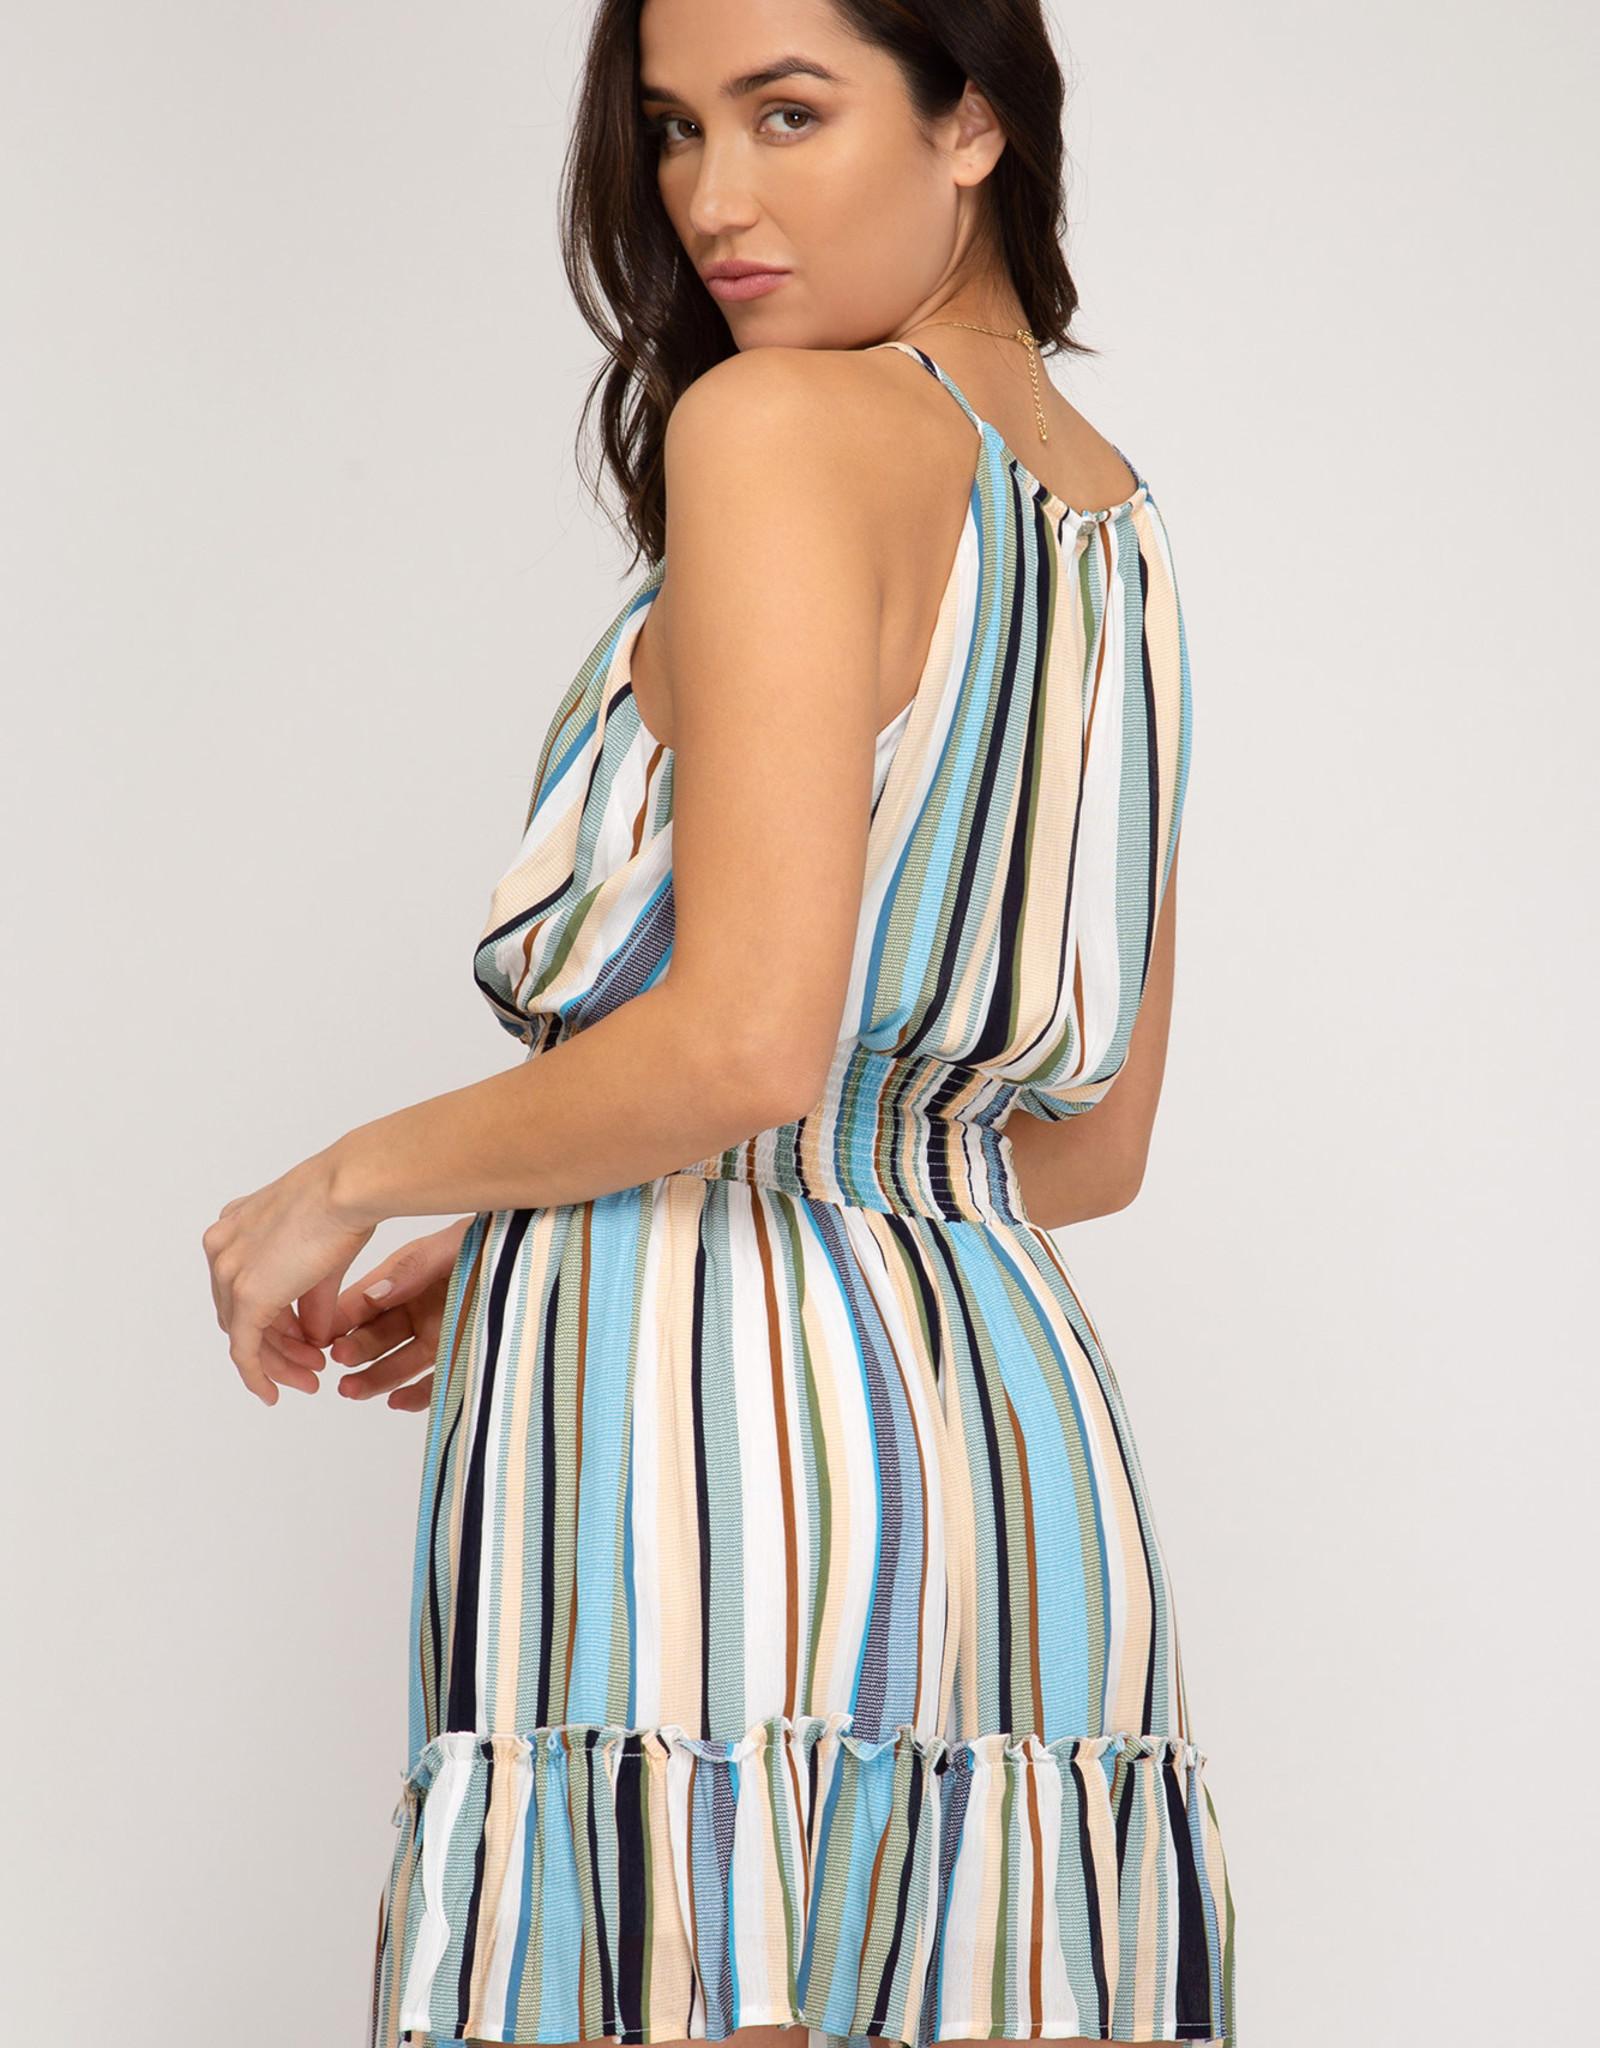 Ladies' Fashions Sleeveless Dress w/Smocked Waistband